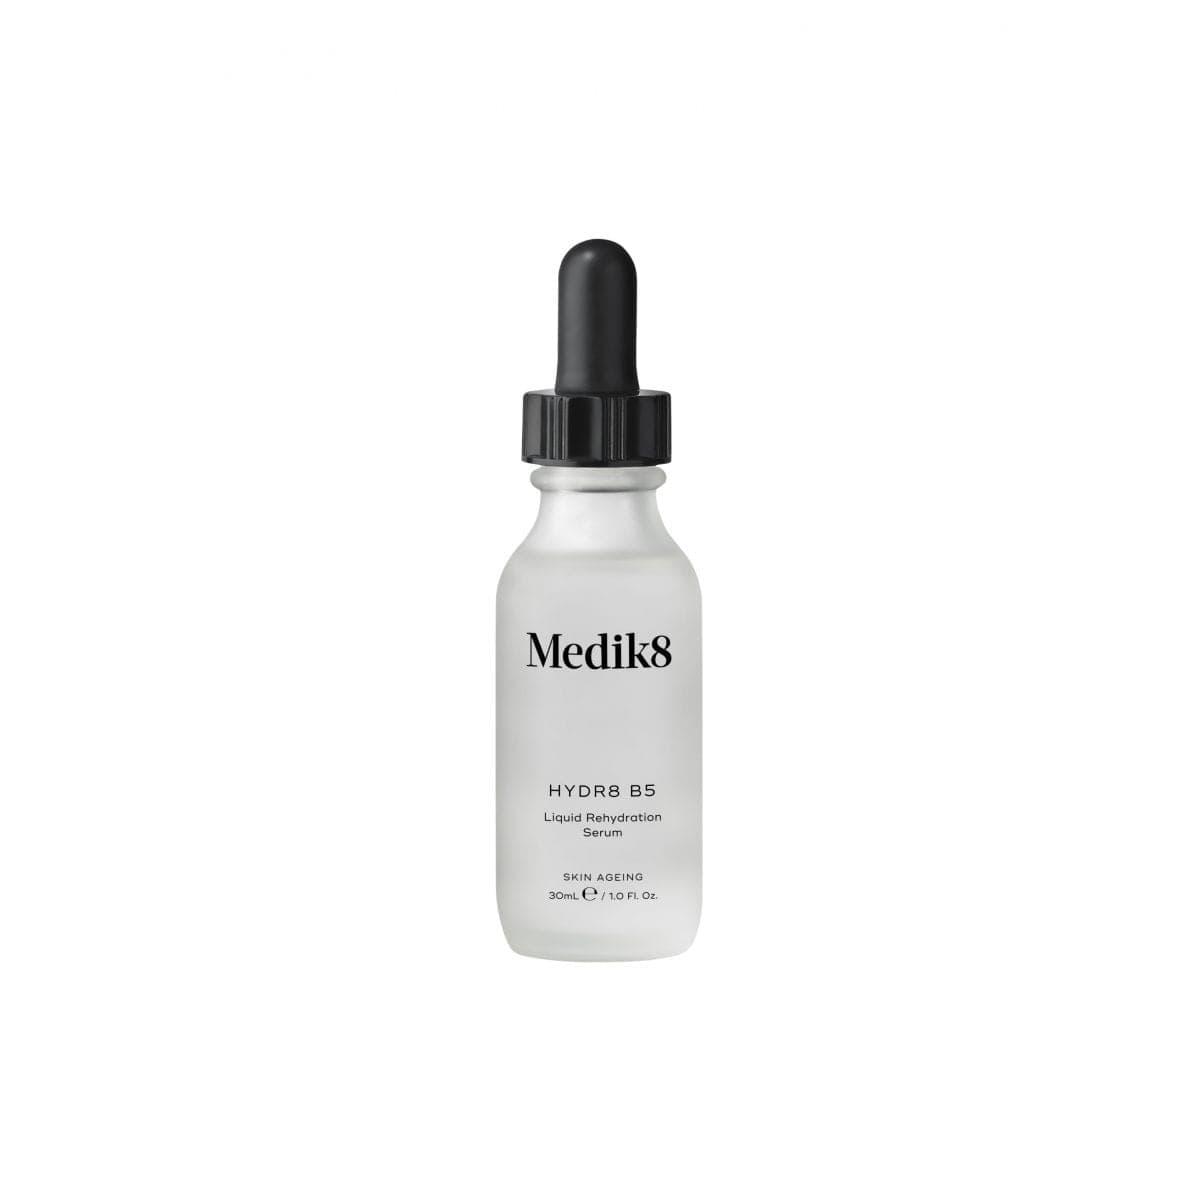 Hydrating skin serum from Medik8 with hyaluronic acid